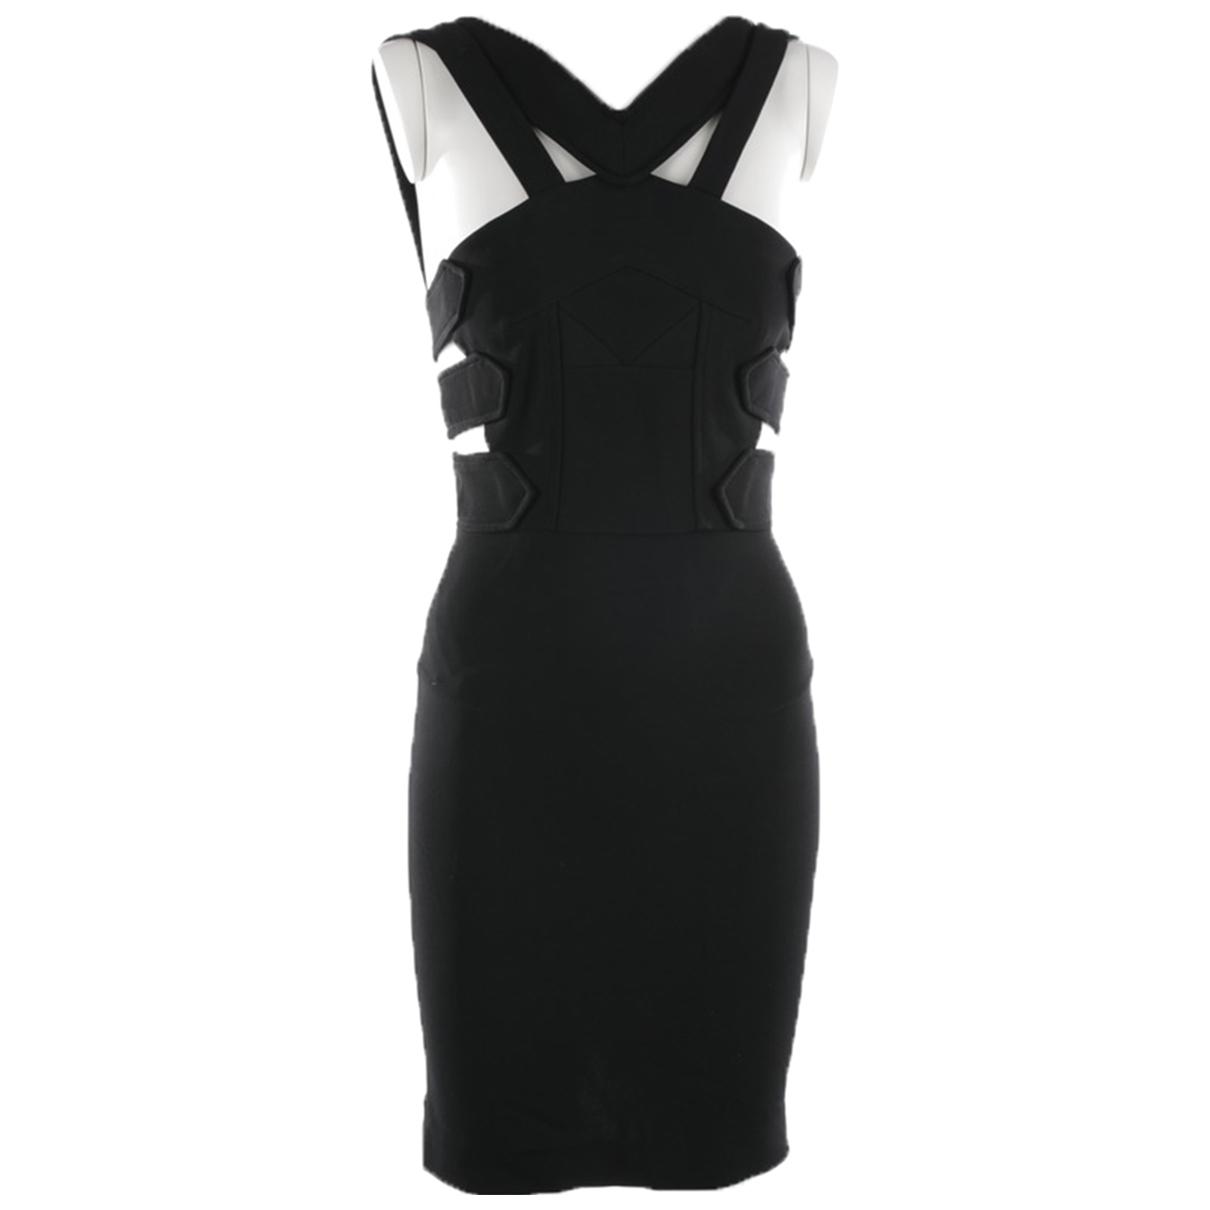 Roland Mouret \N Black Cotton dress for Women 34 FR